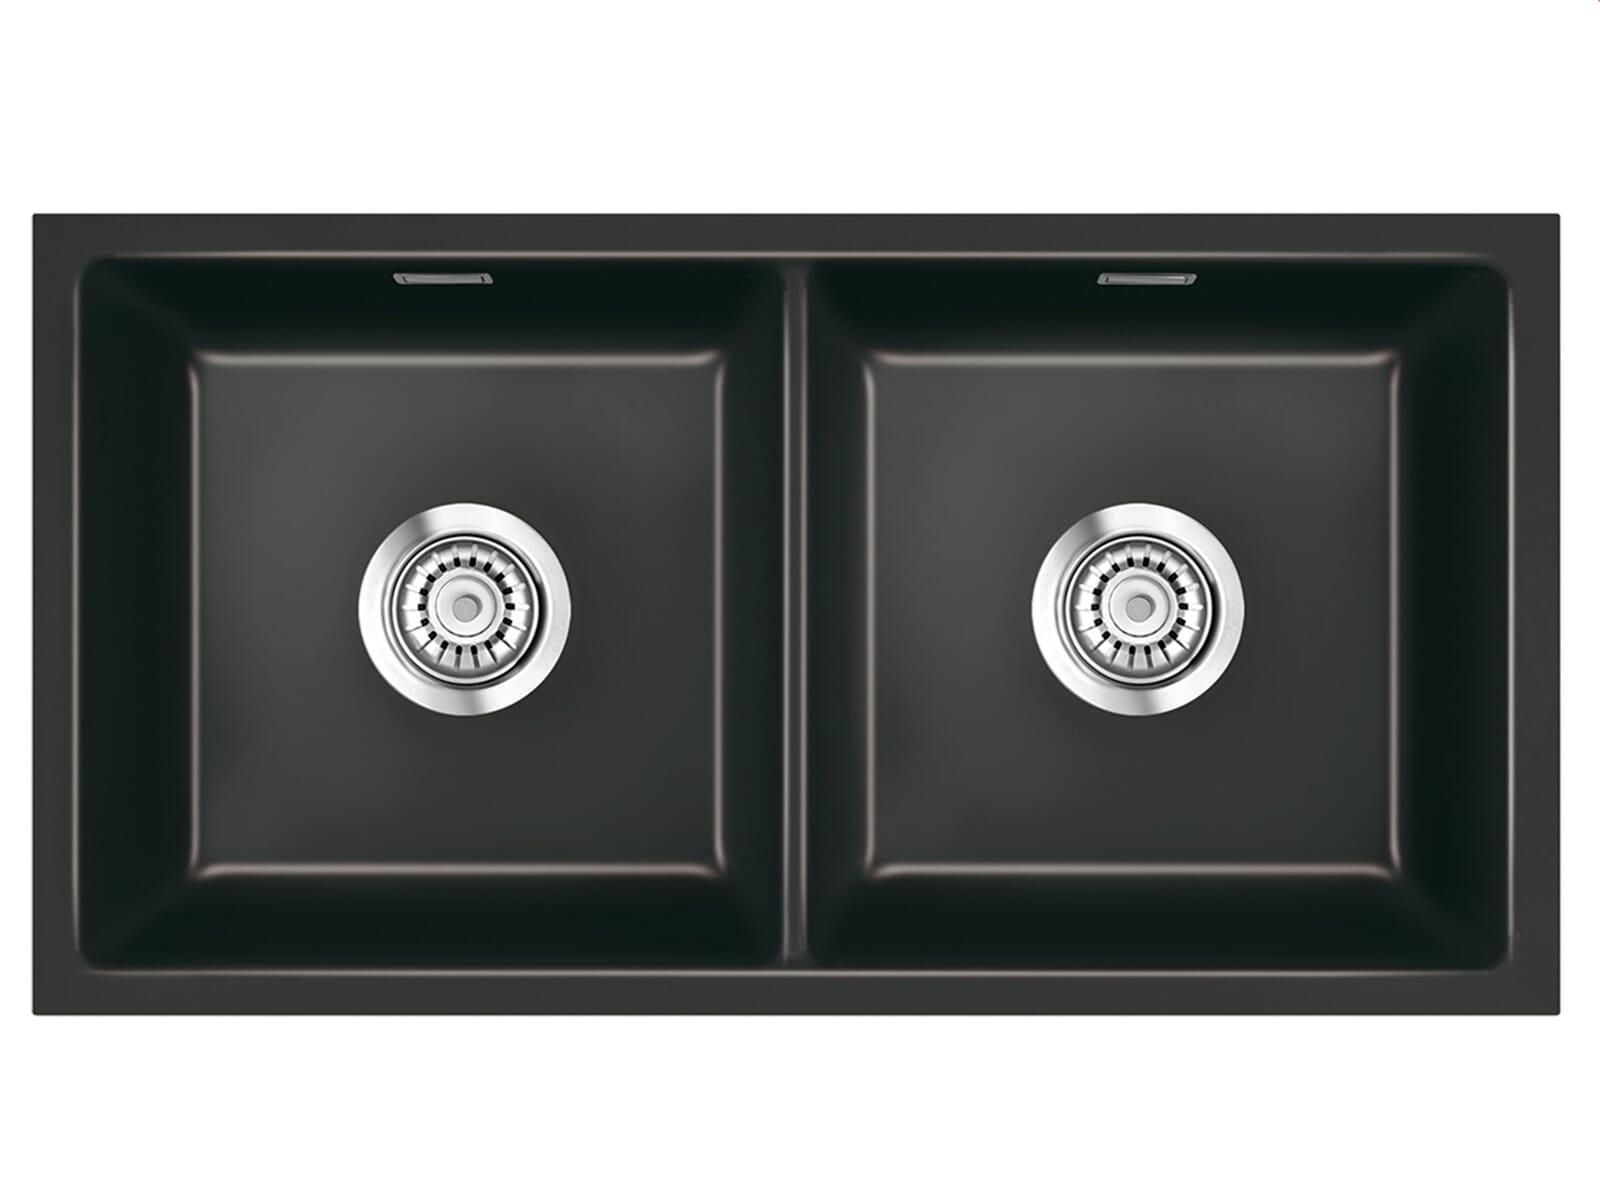 Systemceram Mera Twin U Nero Keramikspüle Handbetätigung